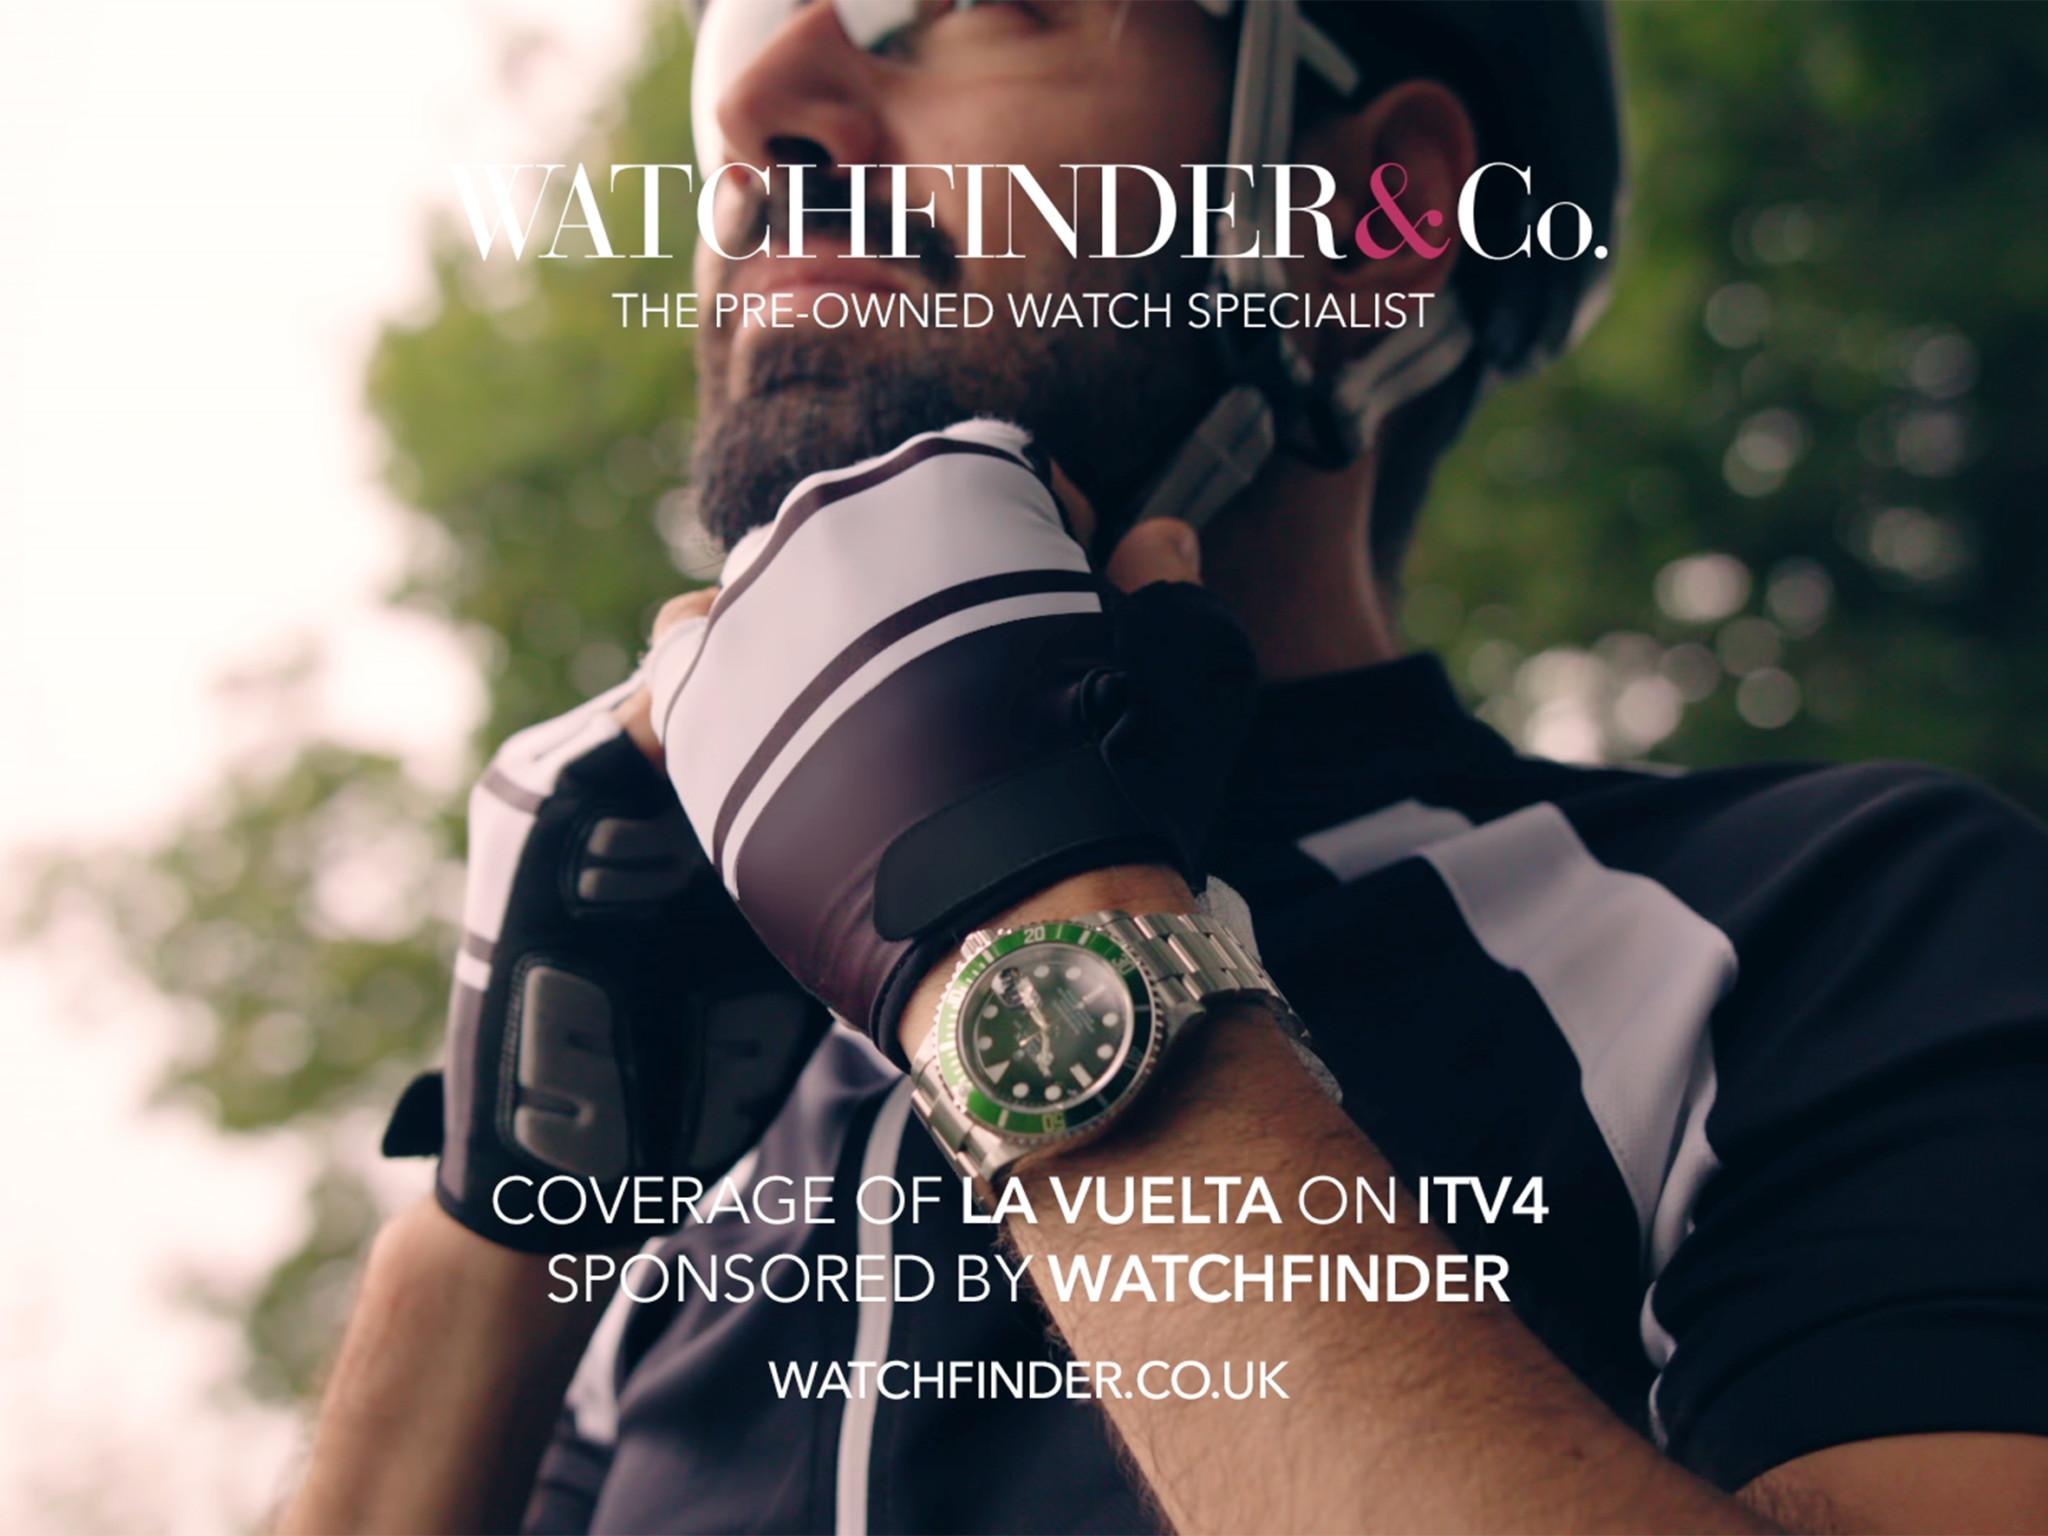 La Vuelta a Espana Watchfinder